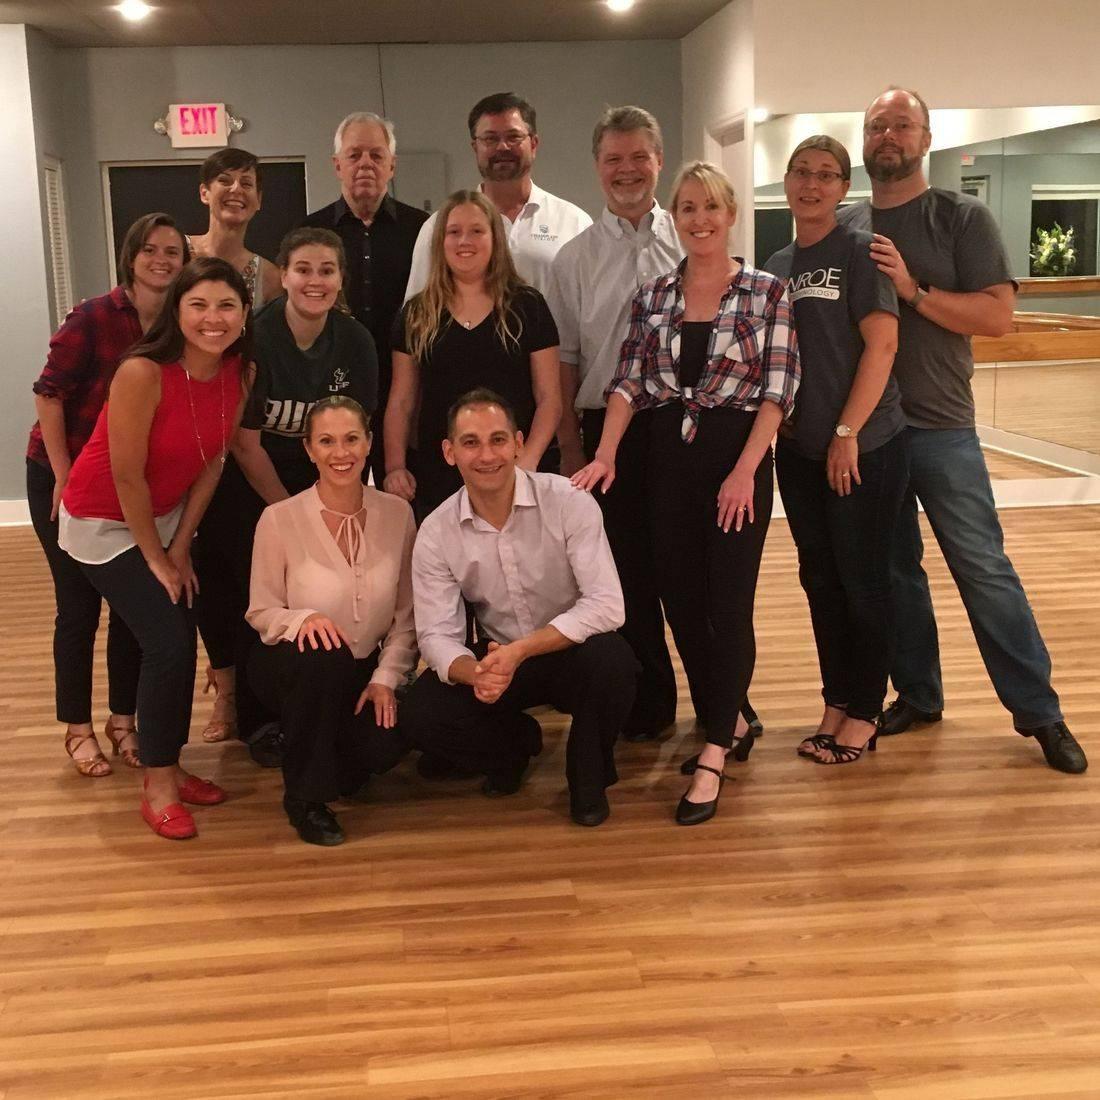 dance studio tampa, group class, dancing classes, dance lessons